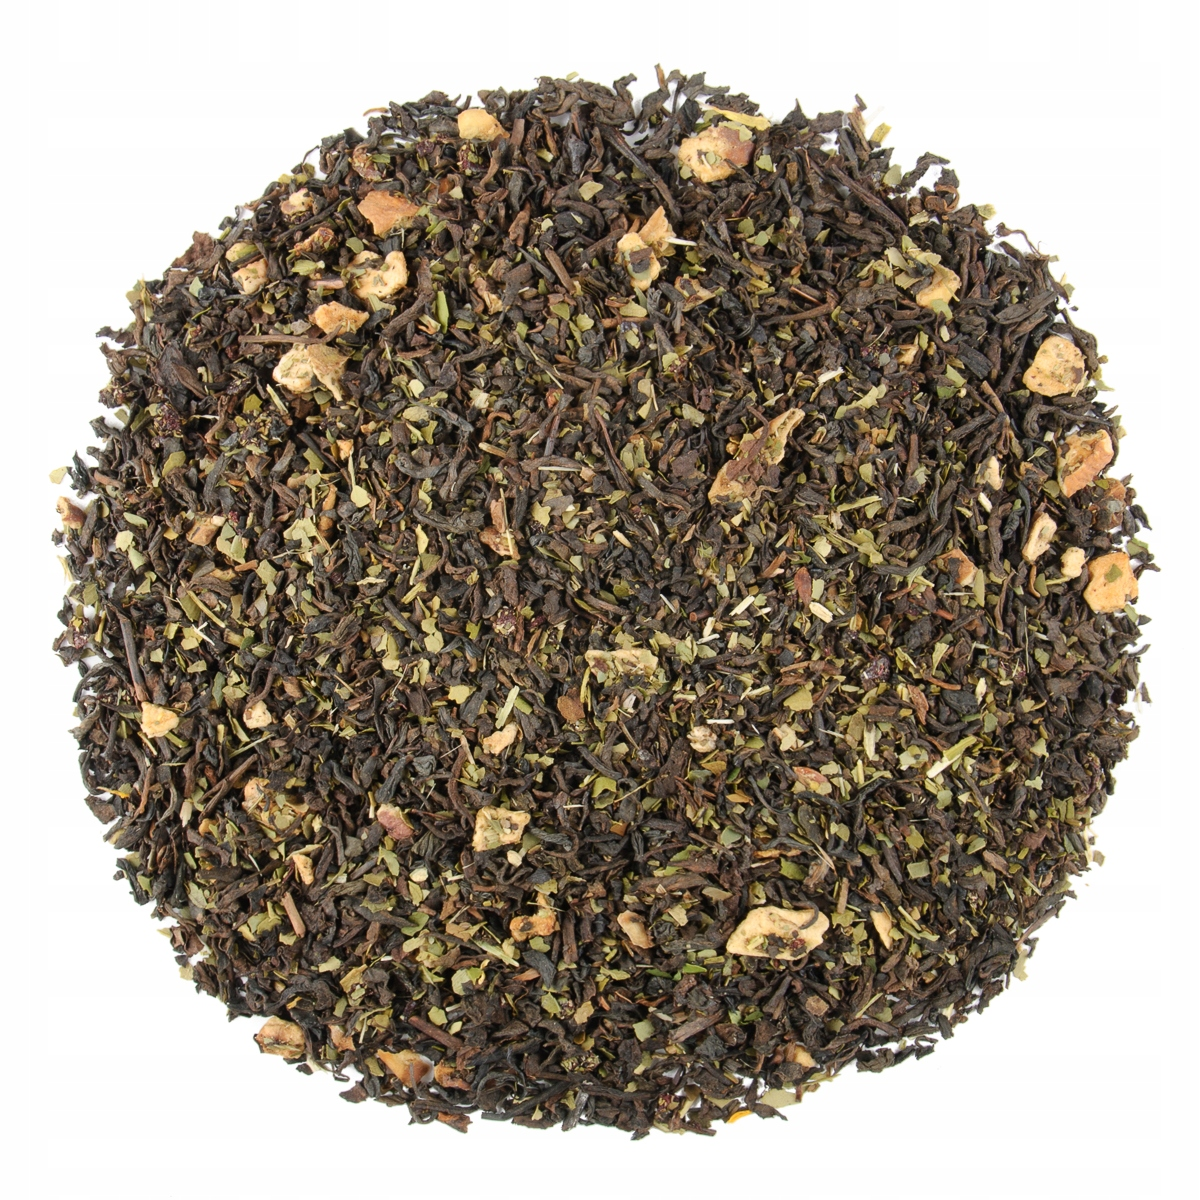 Herbata czerwona 0,5 kg Pu Erh Body Fit